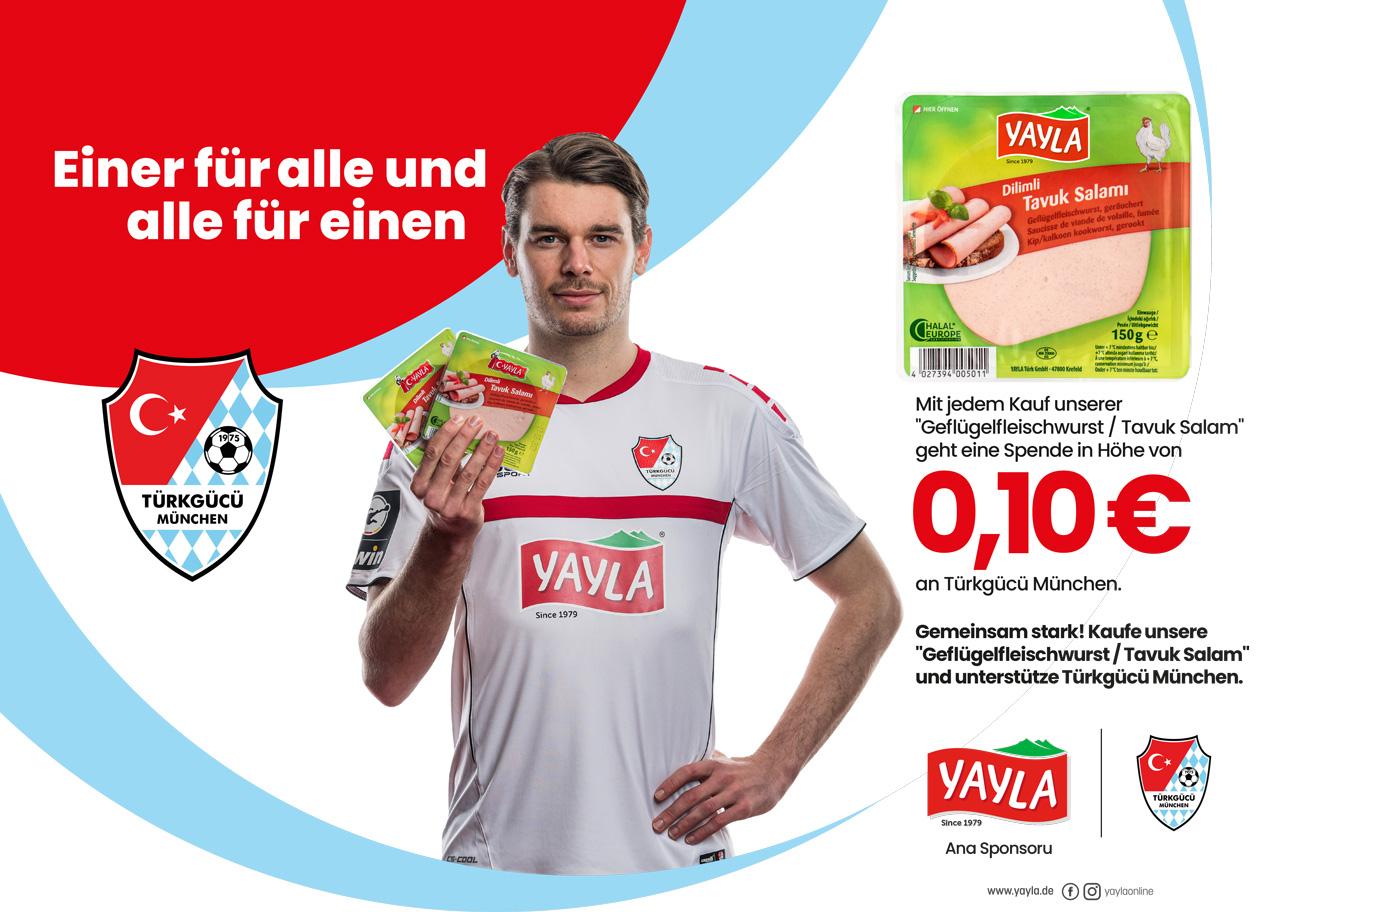 YAYLA_Gewinnspiel_Yogurt_Web-Blog_DEjWoaGzZxvcKFl